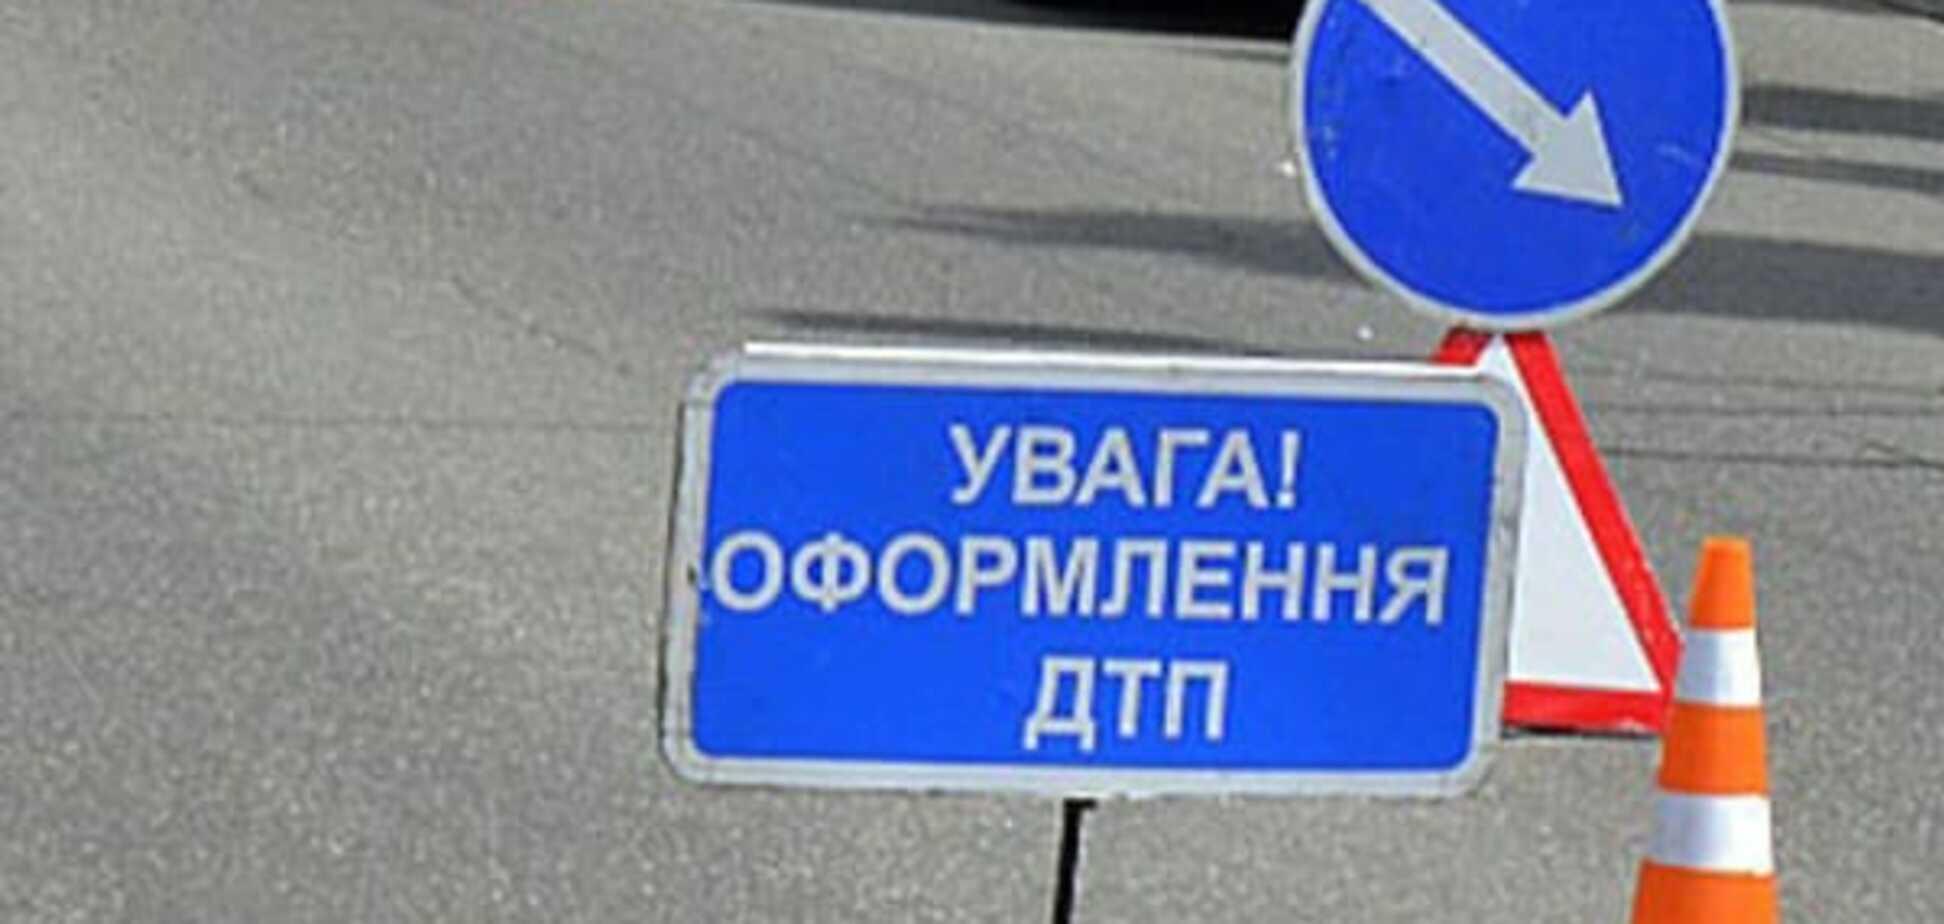 У Києві маршрутка потрапила в ДТП, постраждала дитина